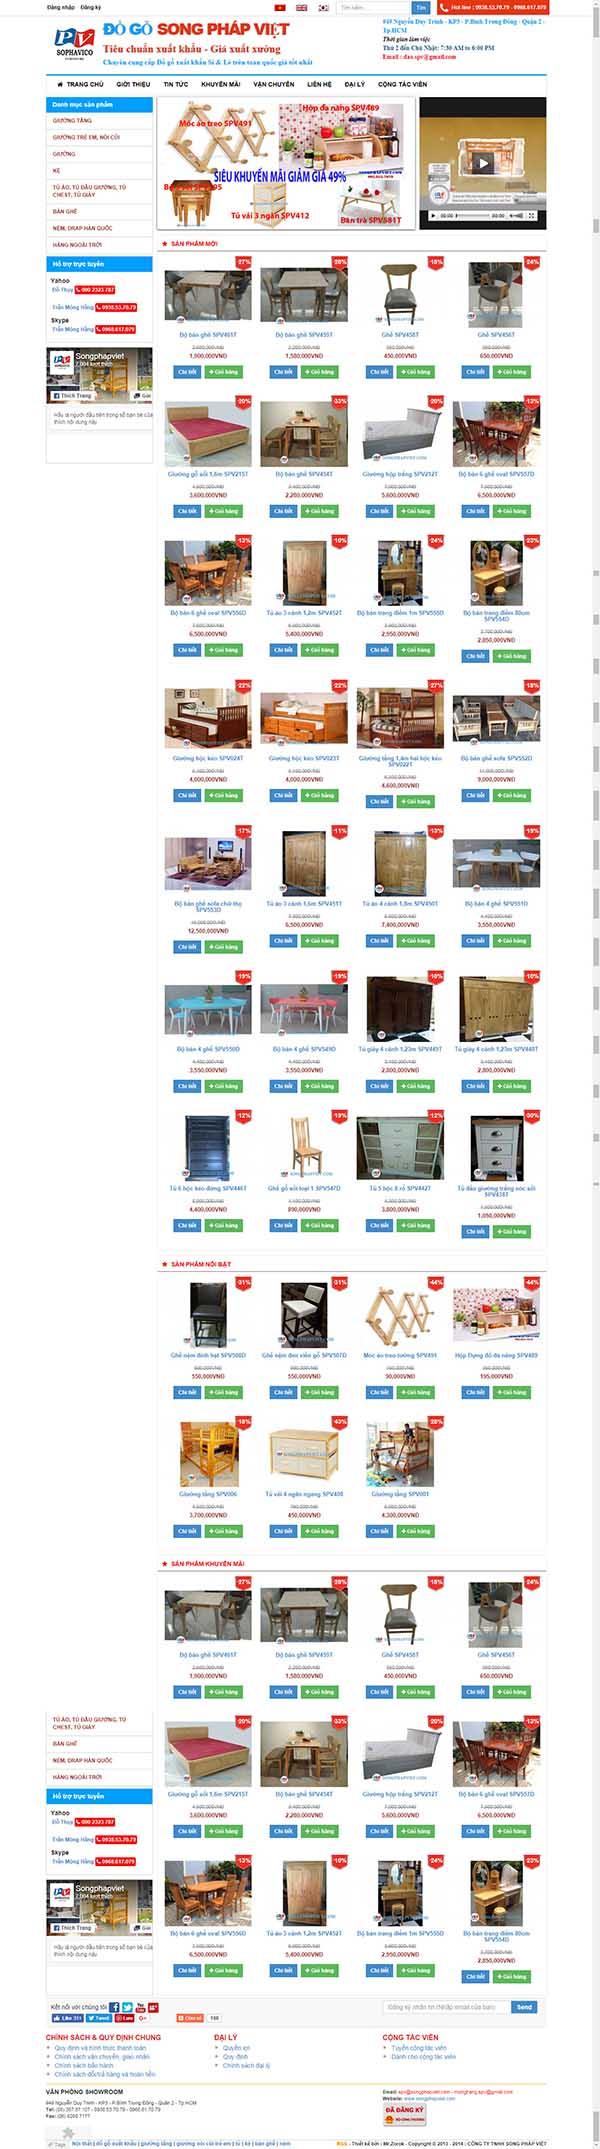 Thiết kế Mẫu website đồ gỗ 02